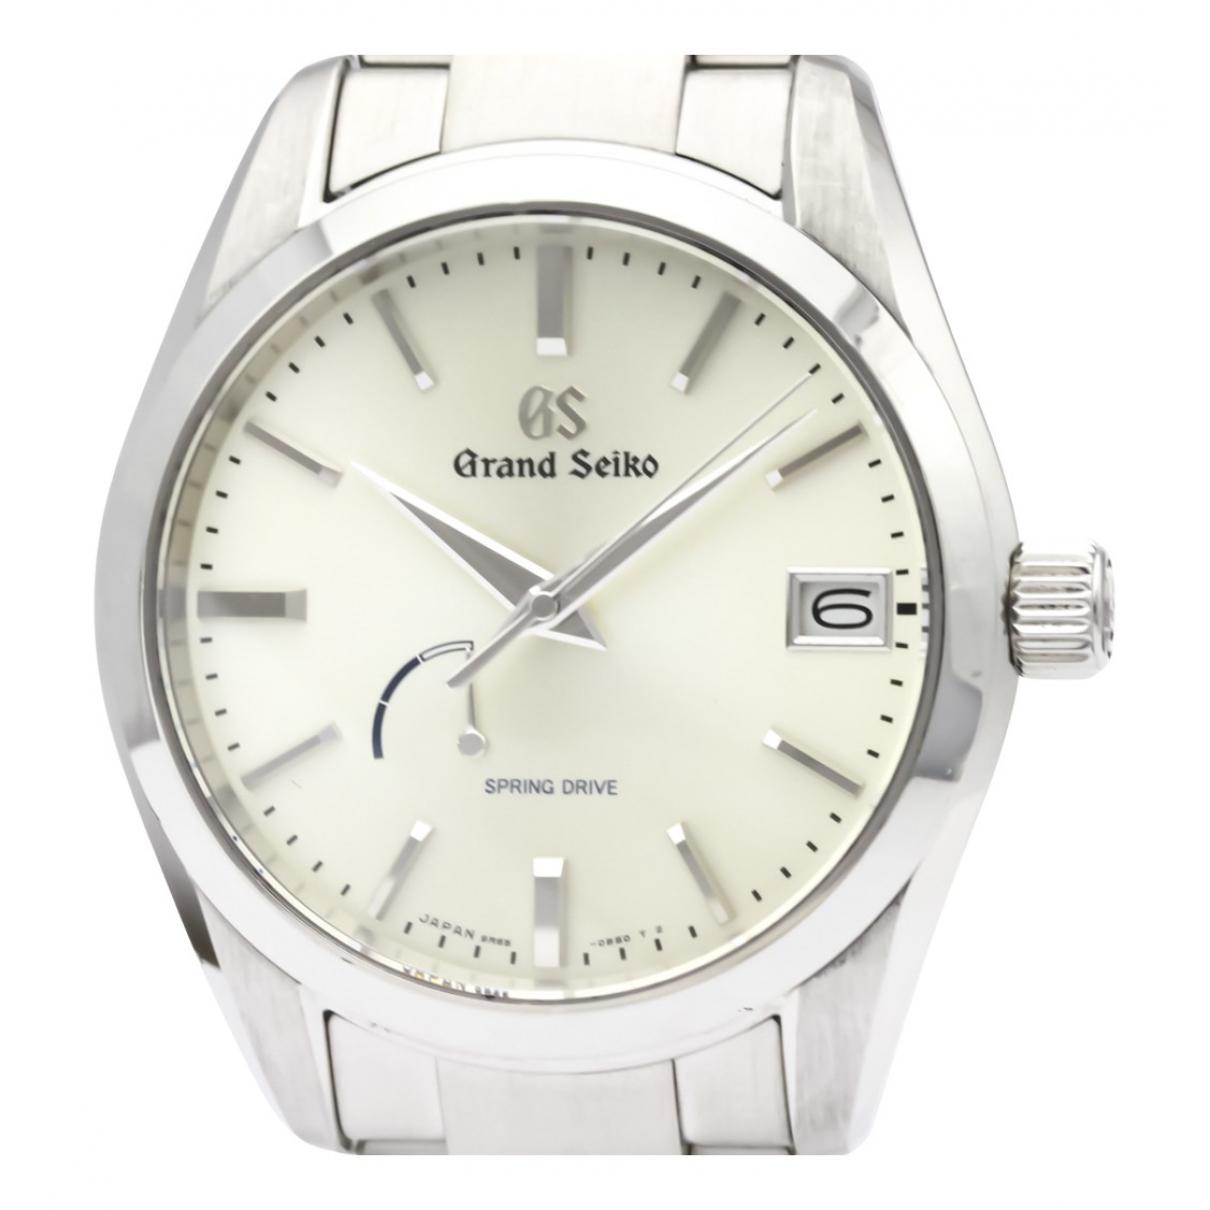 Grand Seiko \N Uhr in  Silber Stahl